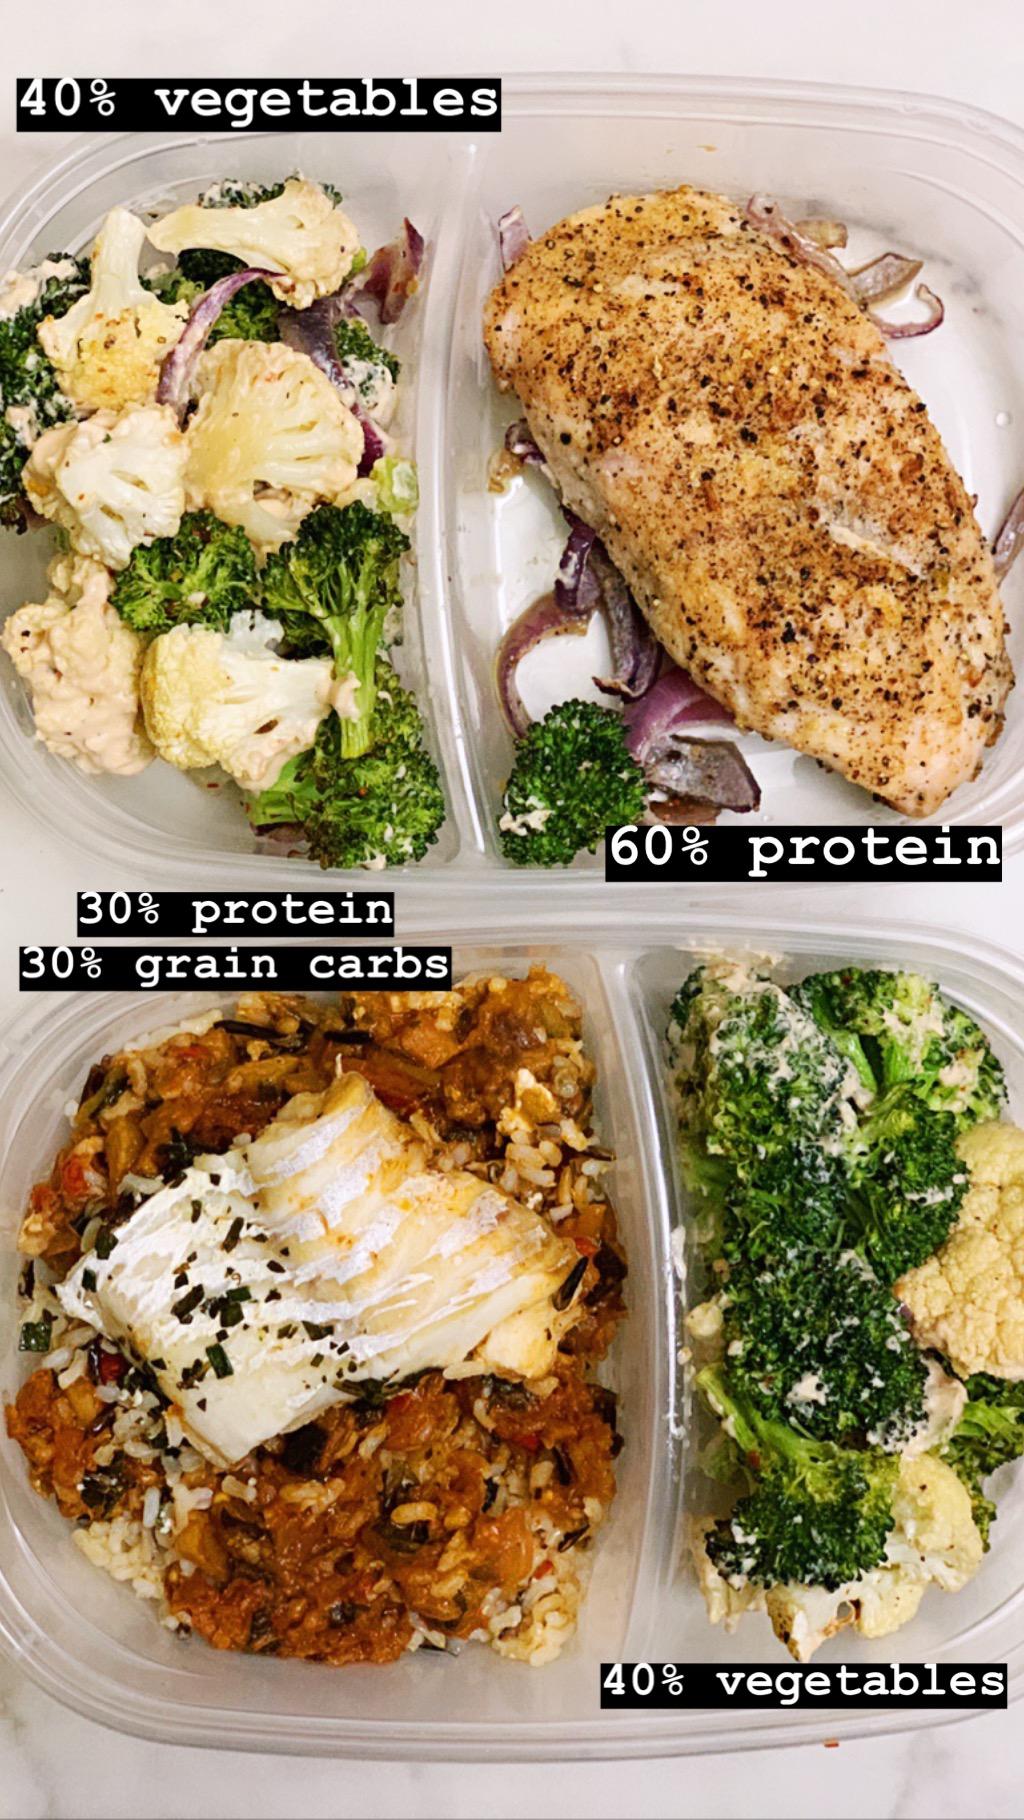 Meal Prep Breakdown